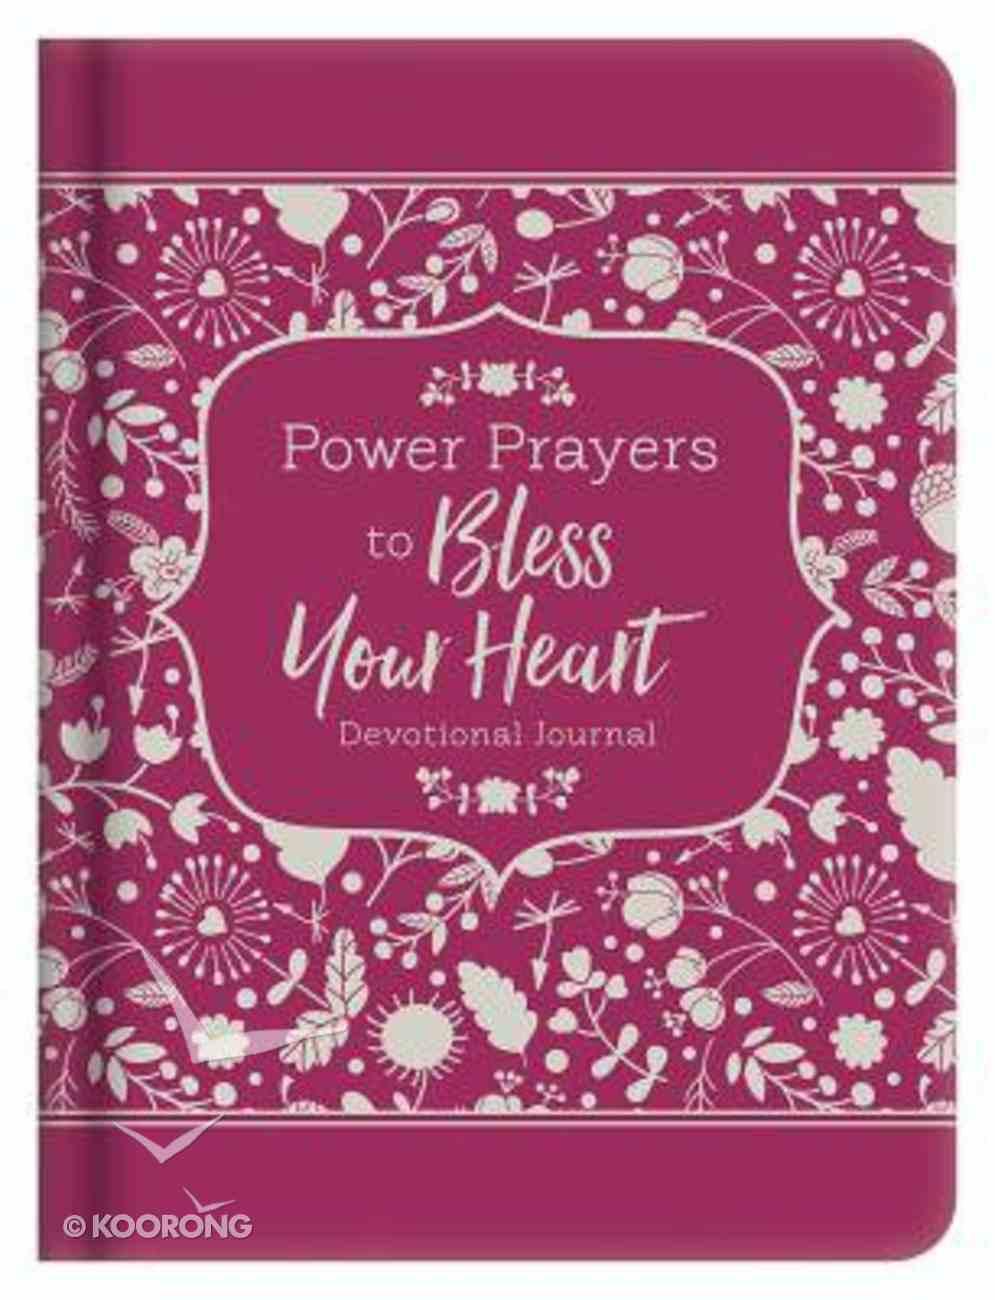 Power Prayers to Bless Your Heart: Devotional Journal Hardback